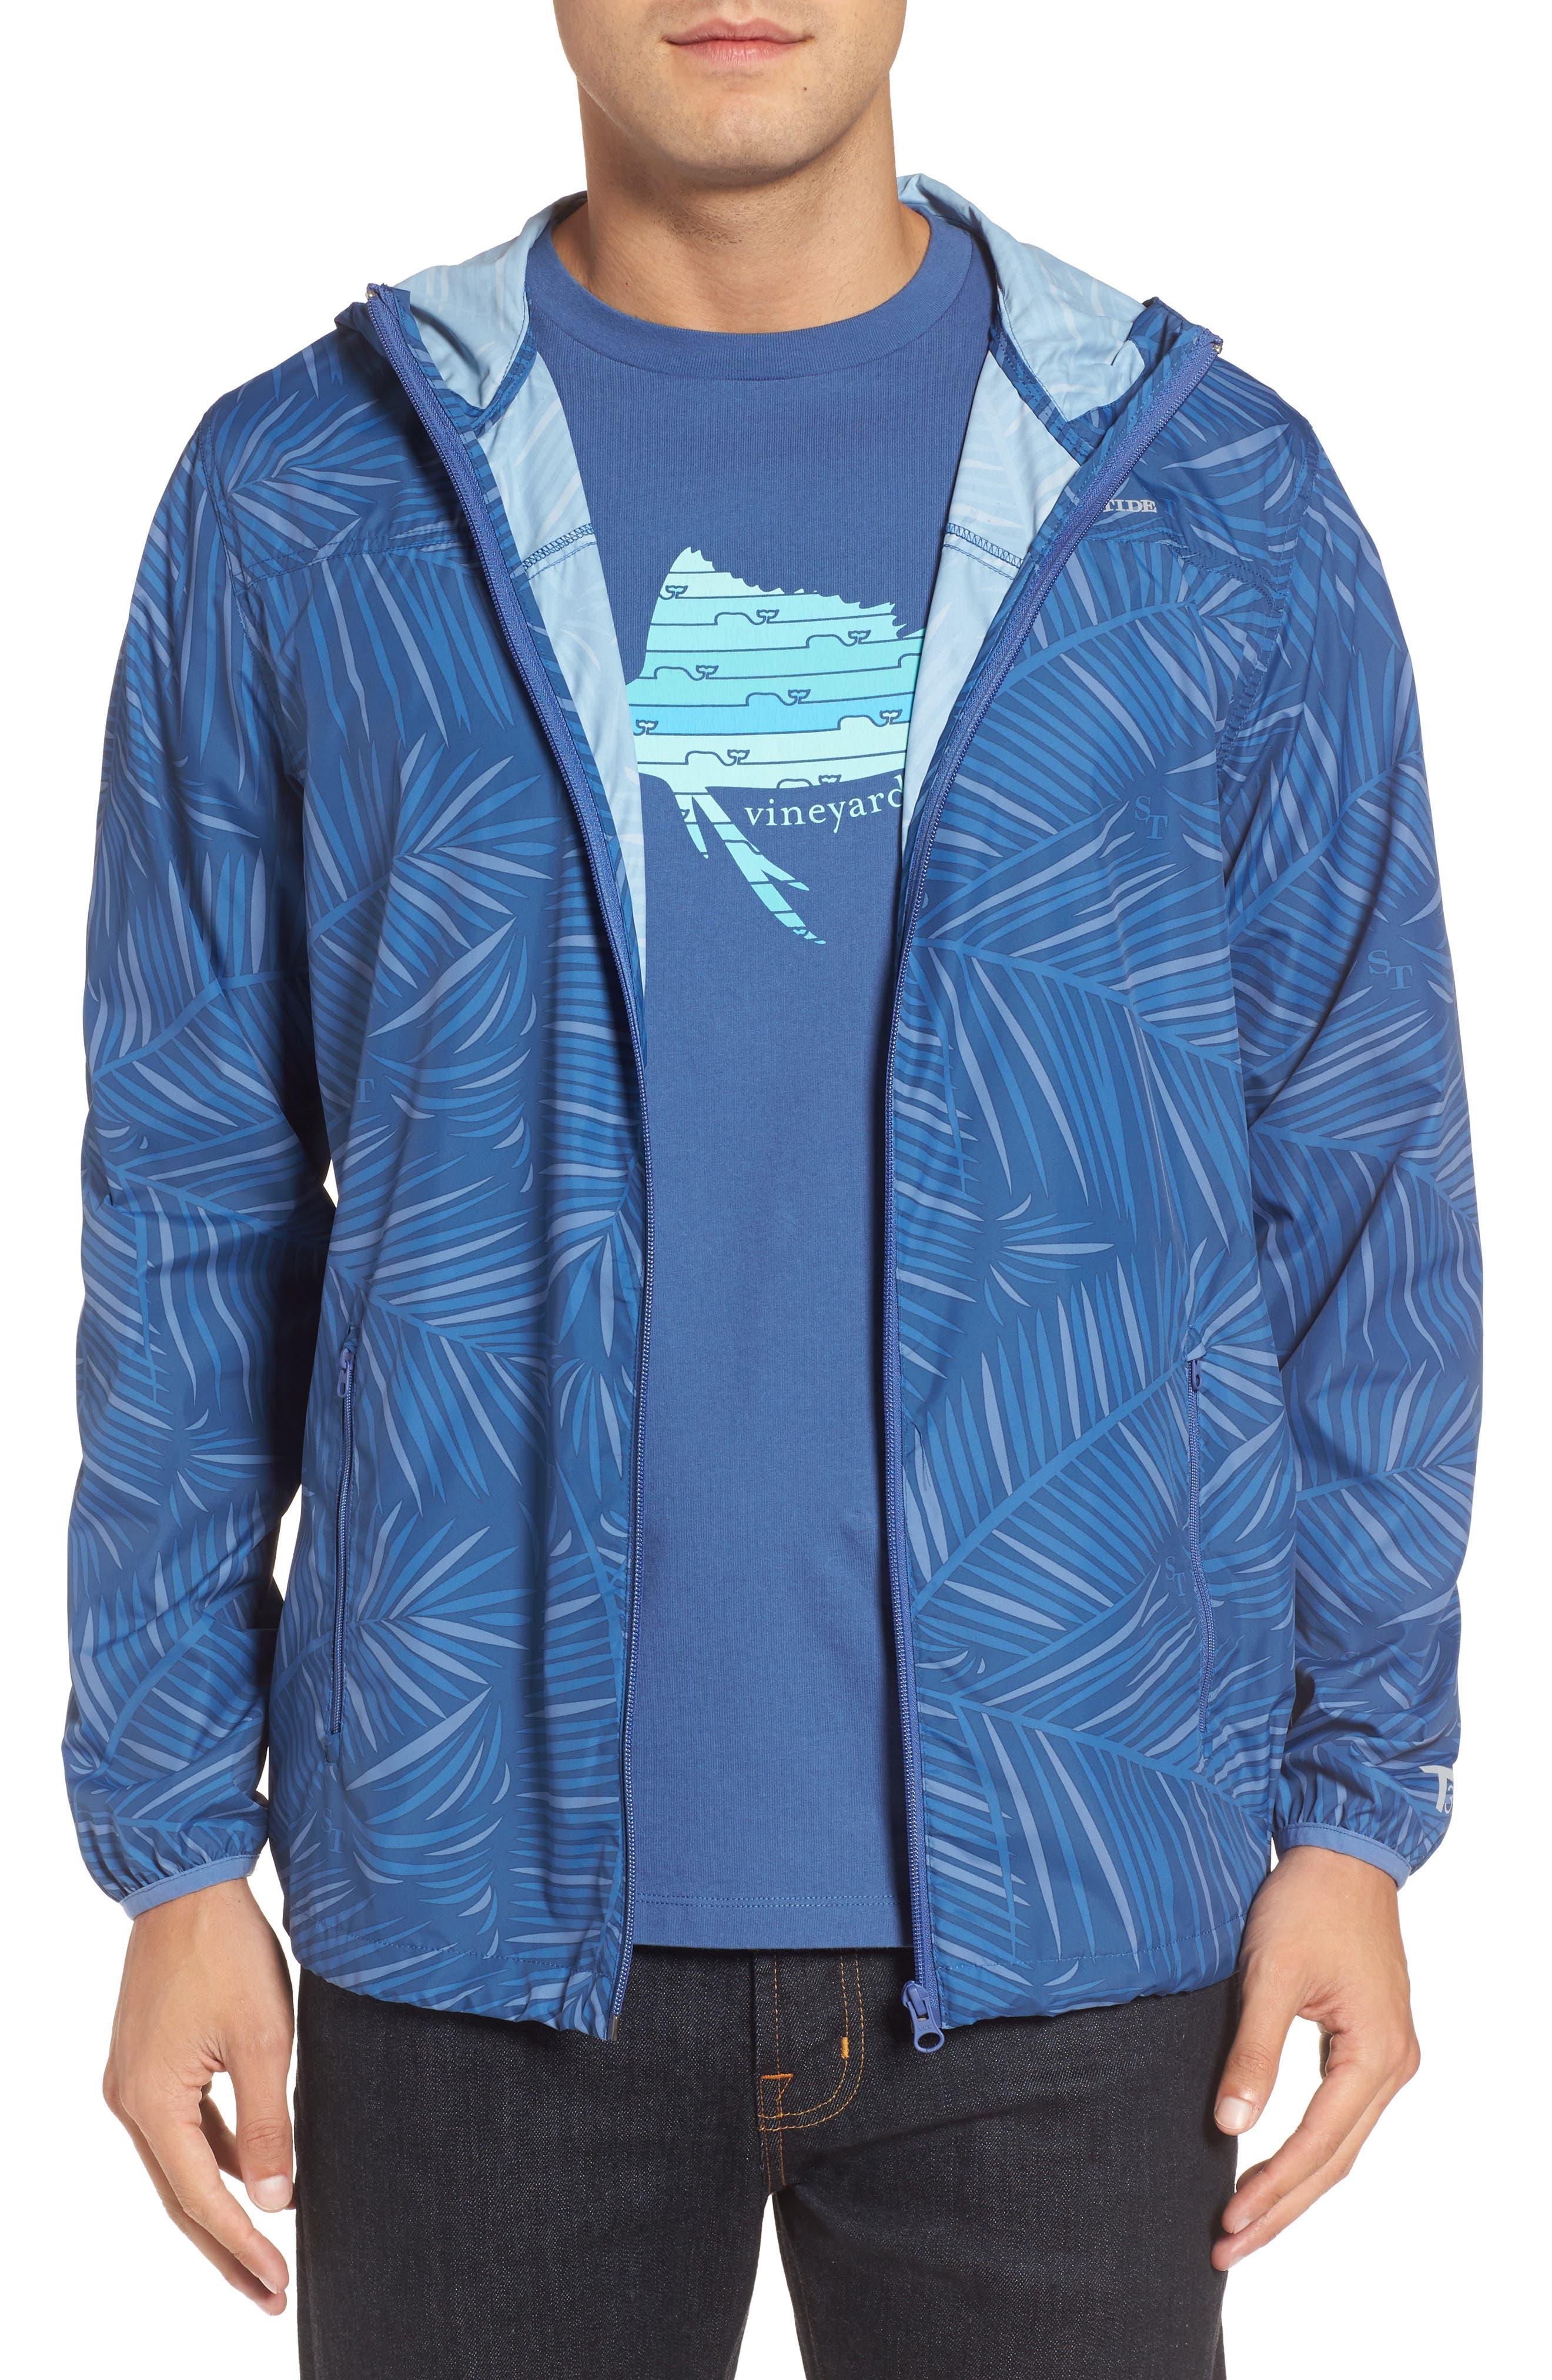 Pelican Peak Full Zip Hooded Jacket,                             Main thumbnail 1, color,                             Seven Seas Blue